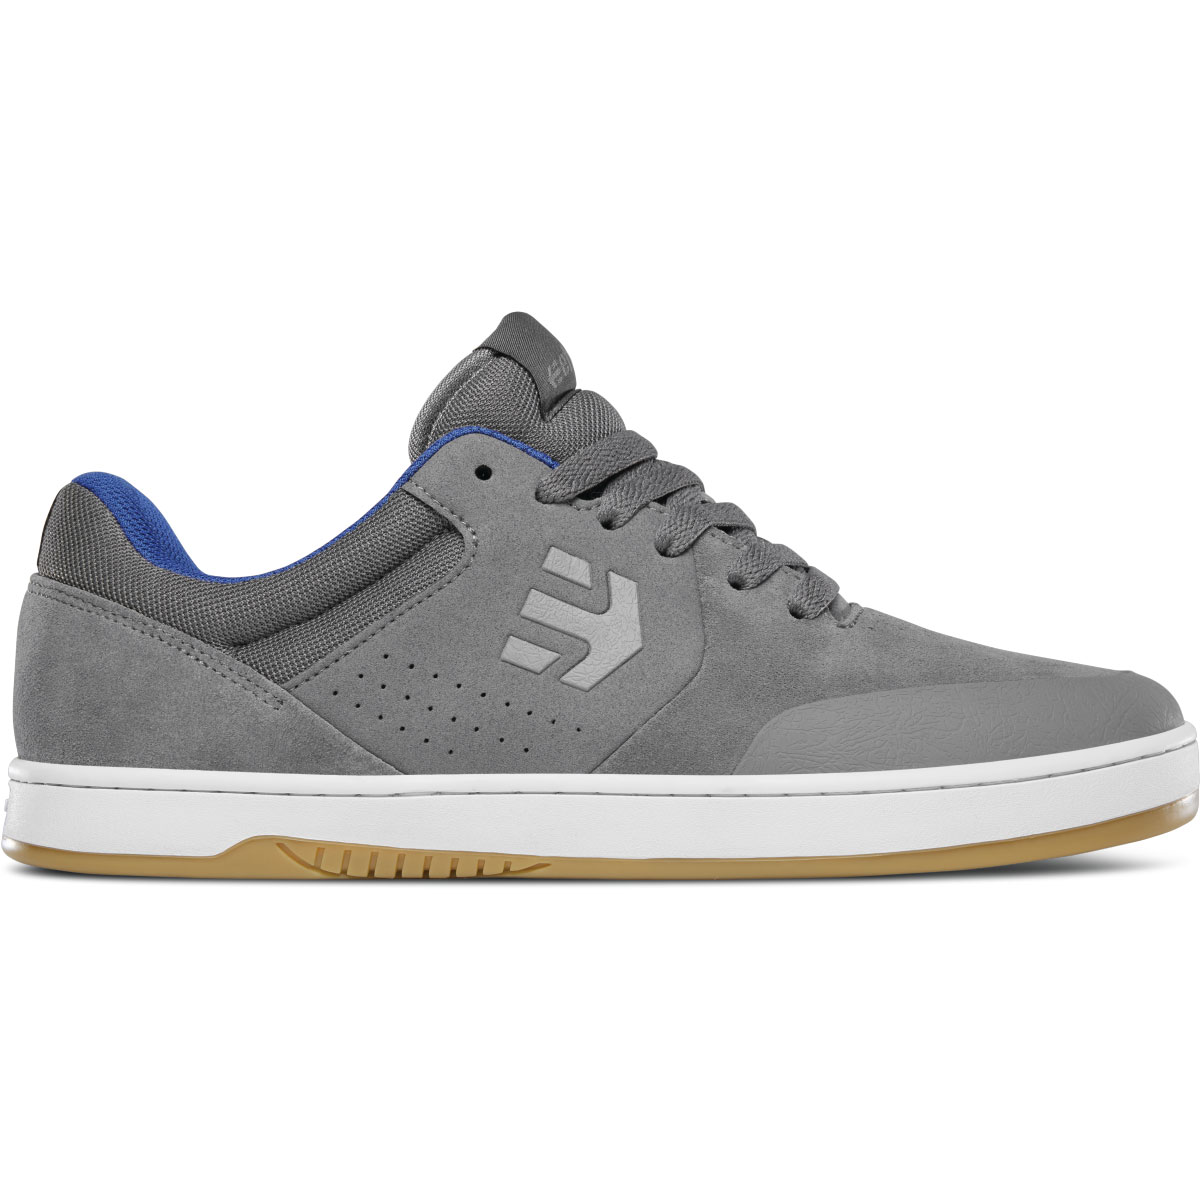 ETNIES Skateboard Shoes MARANA VULC TAUPE